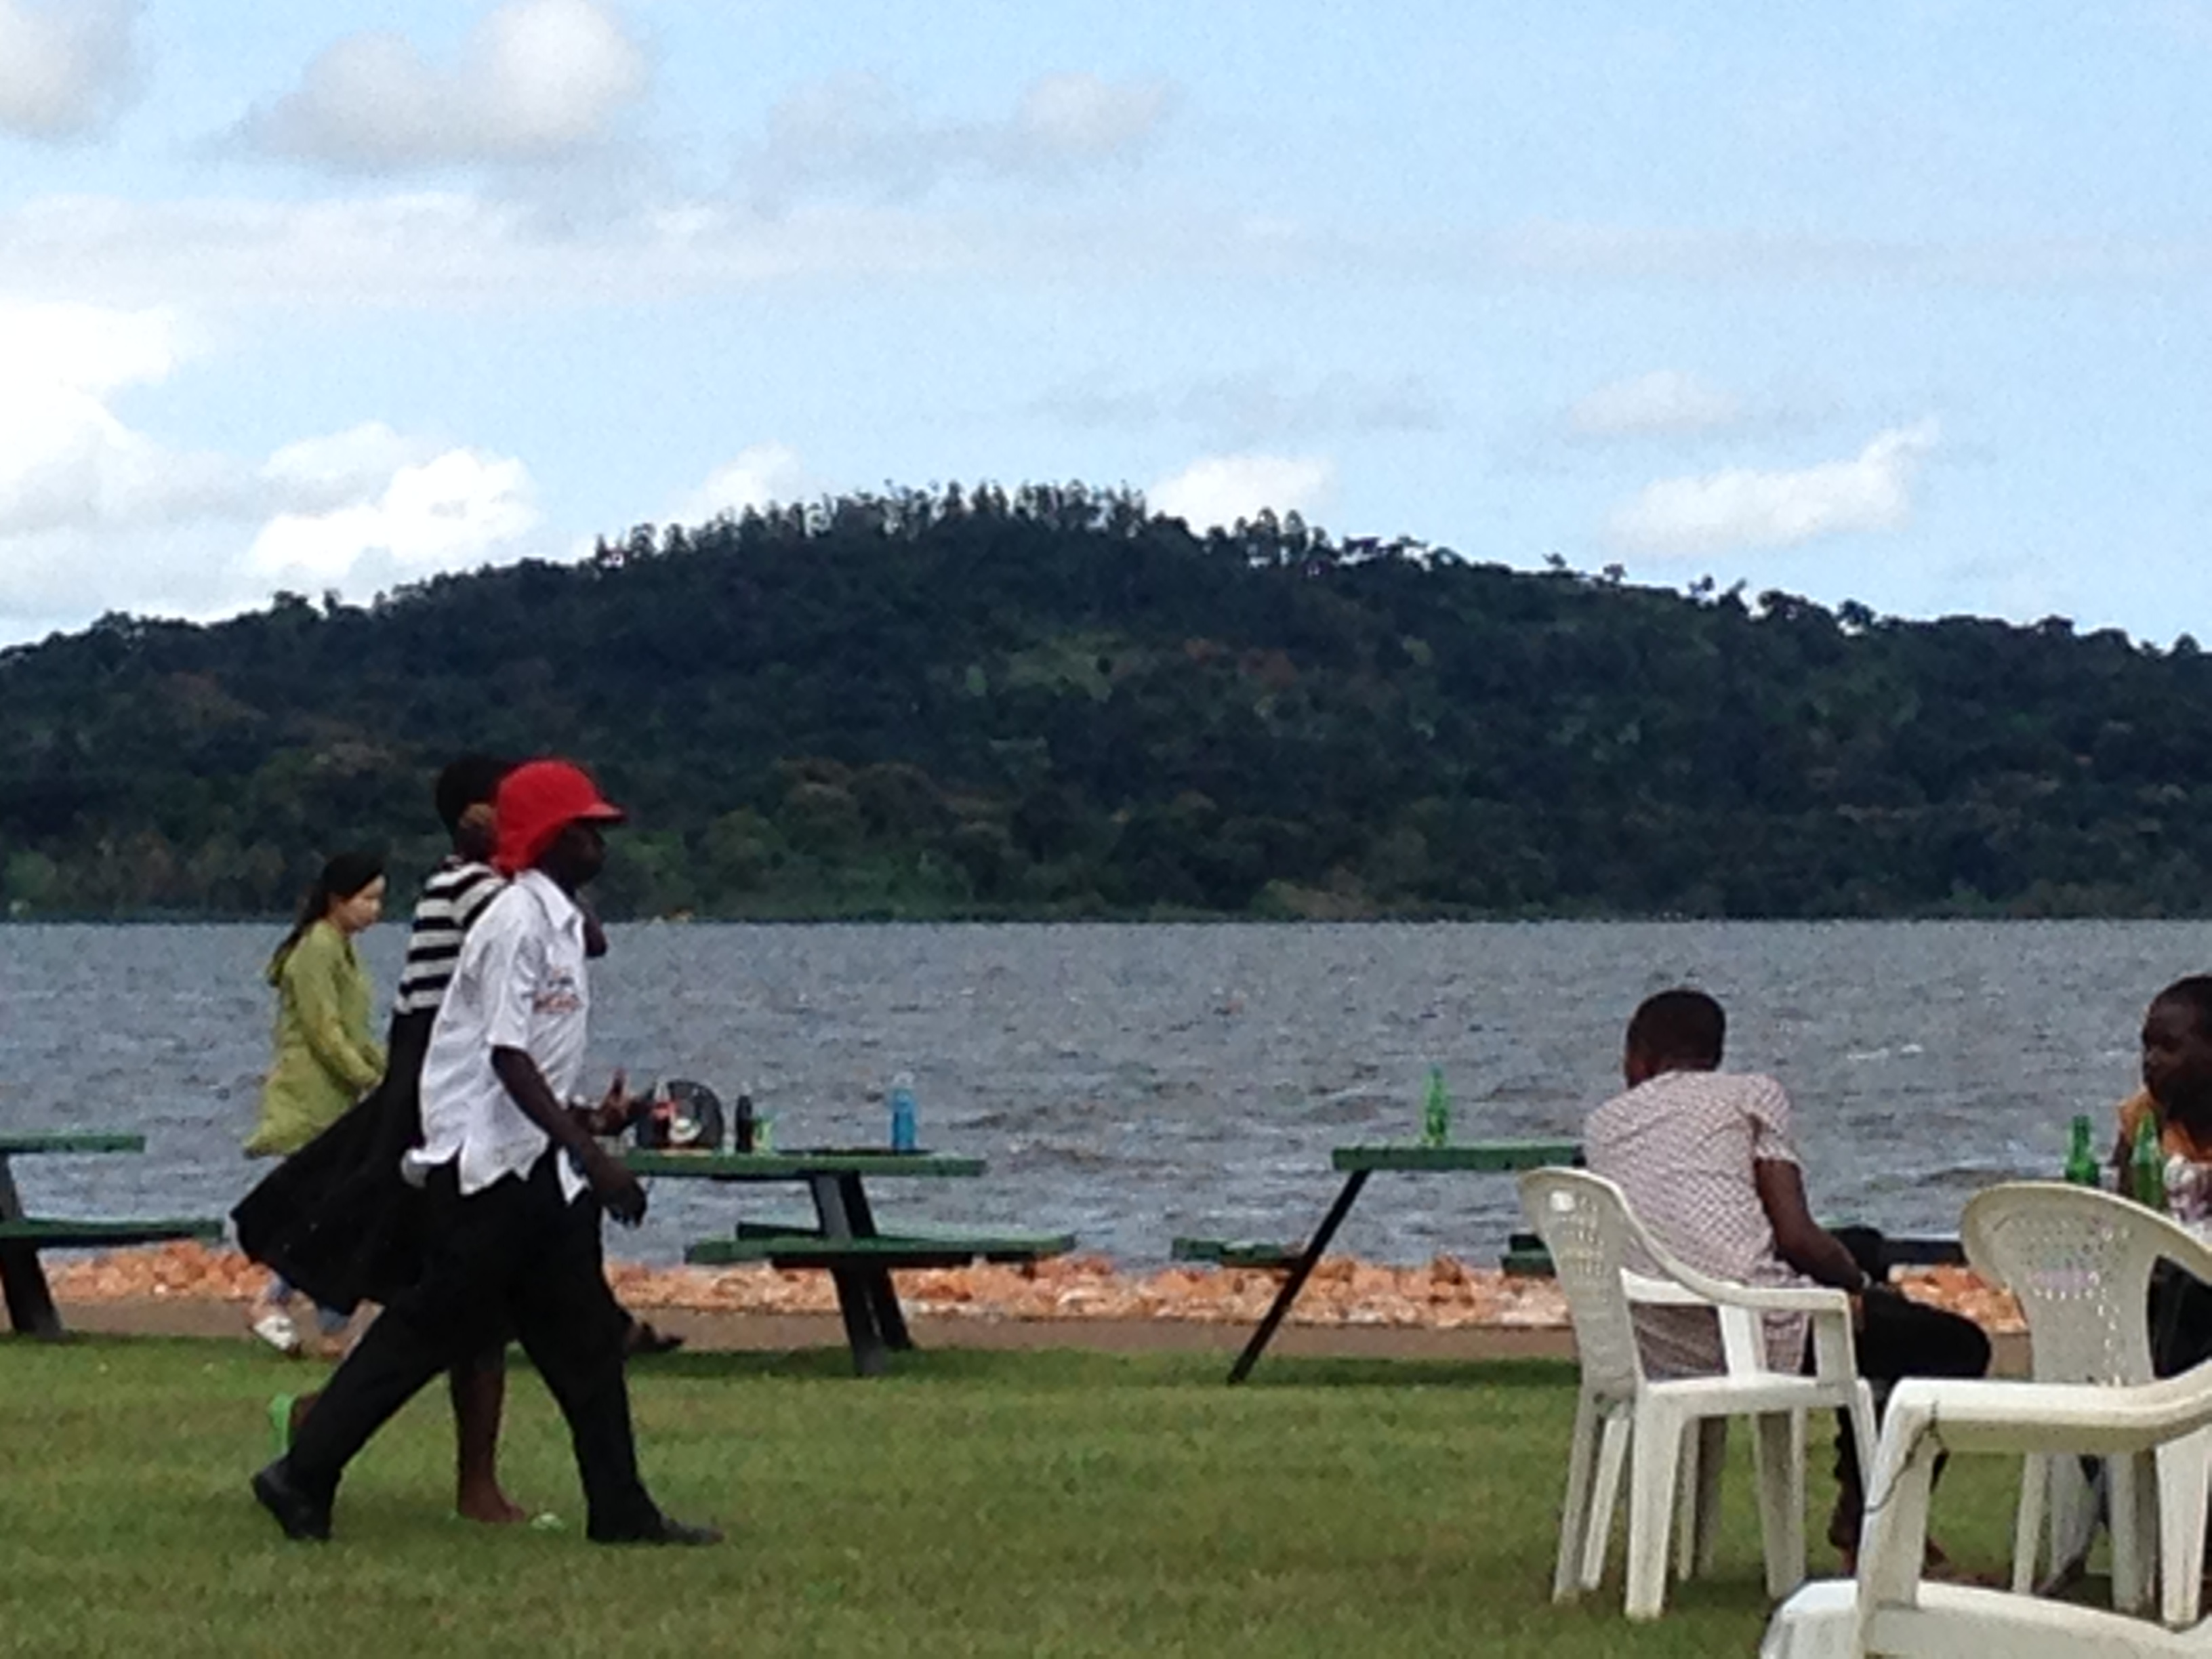 1 Day Fishing Tour Uganda in Lake Victoria - Katona Tours